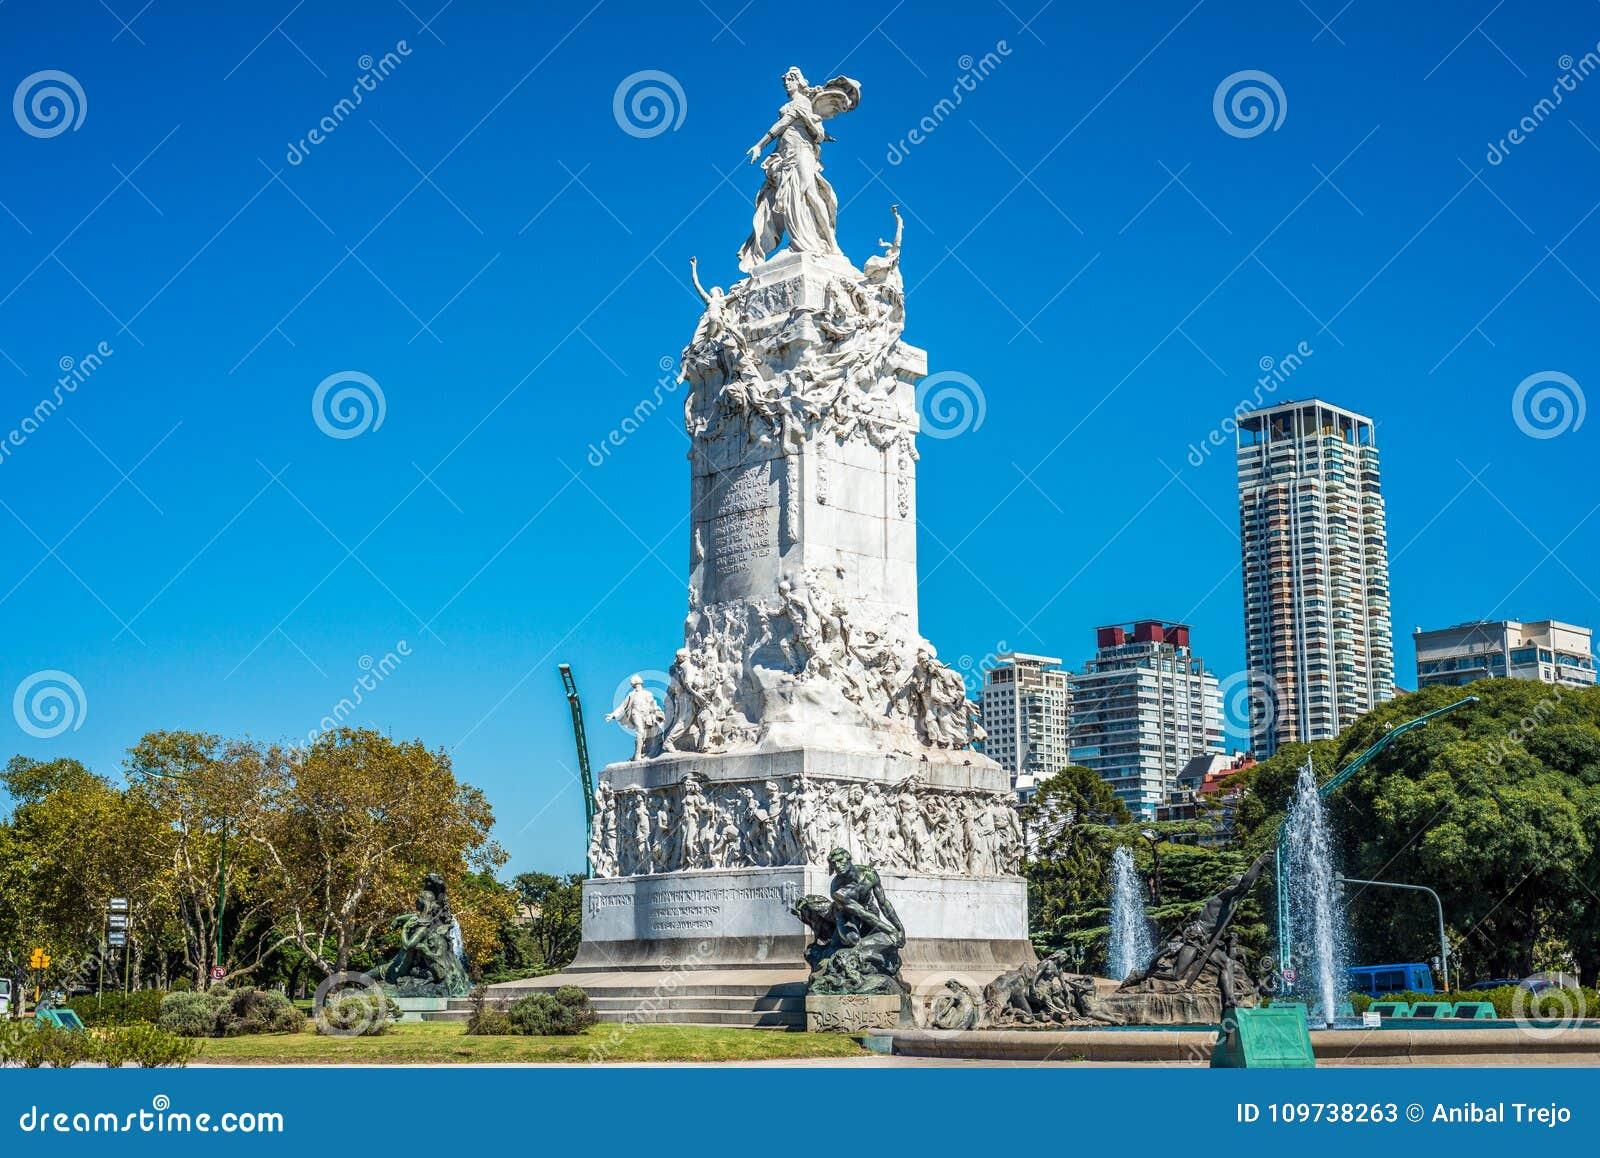 Four Regions monument in Buenos Aires, Argentina